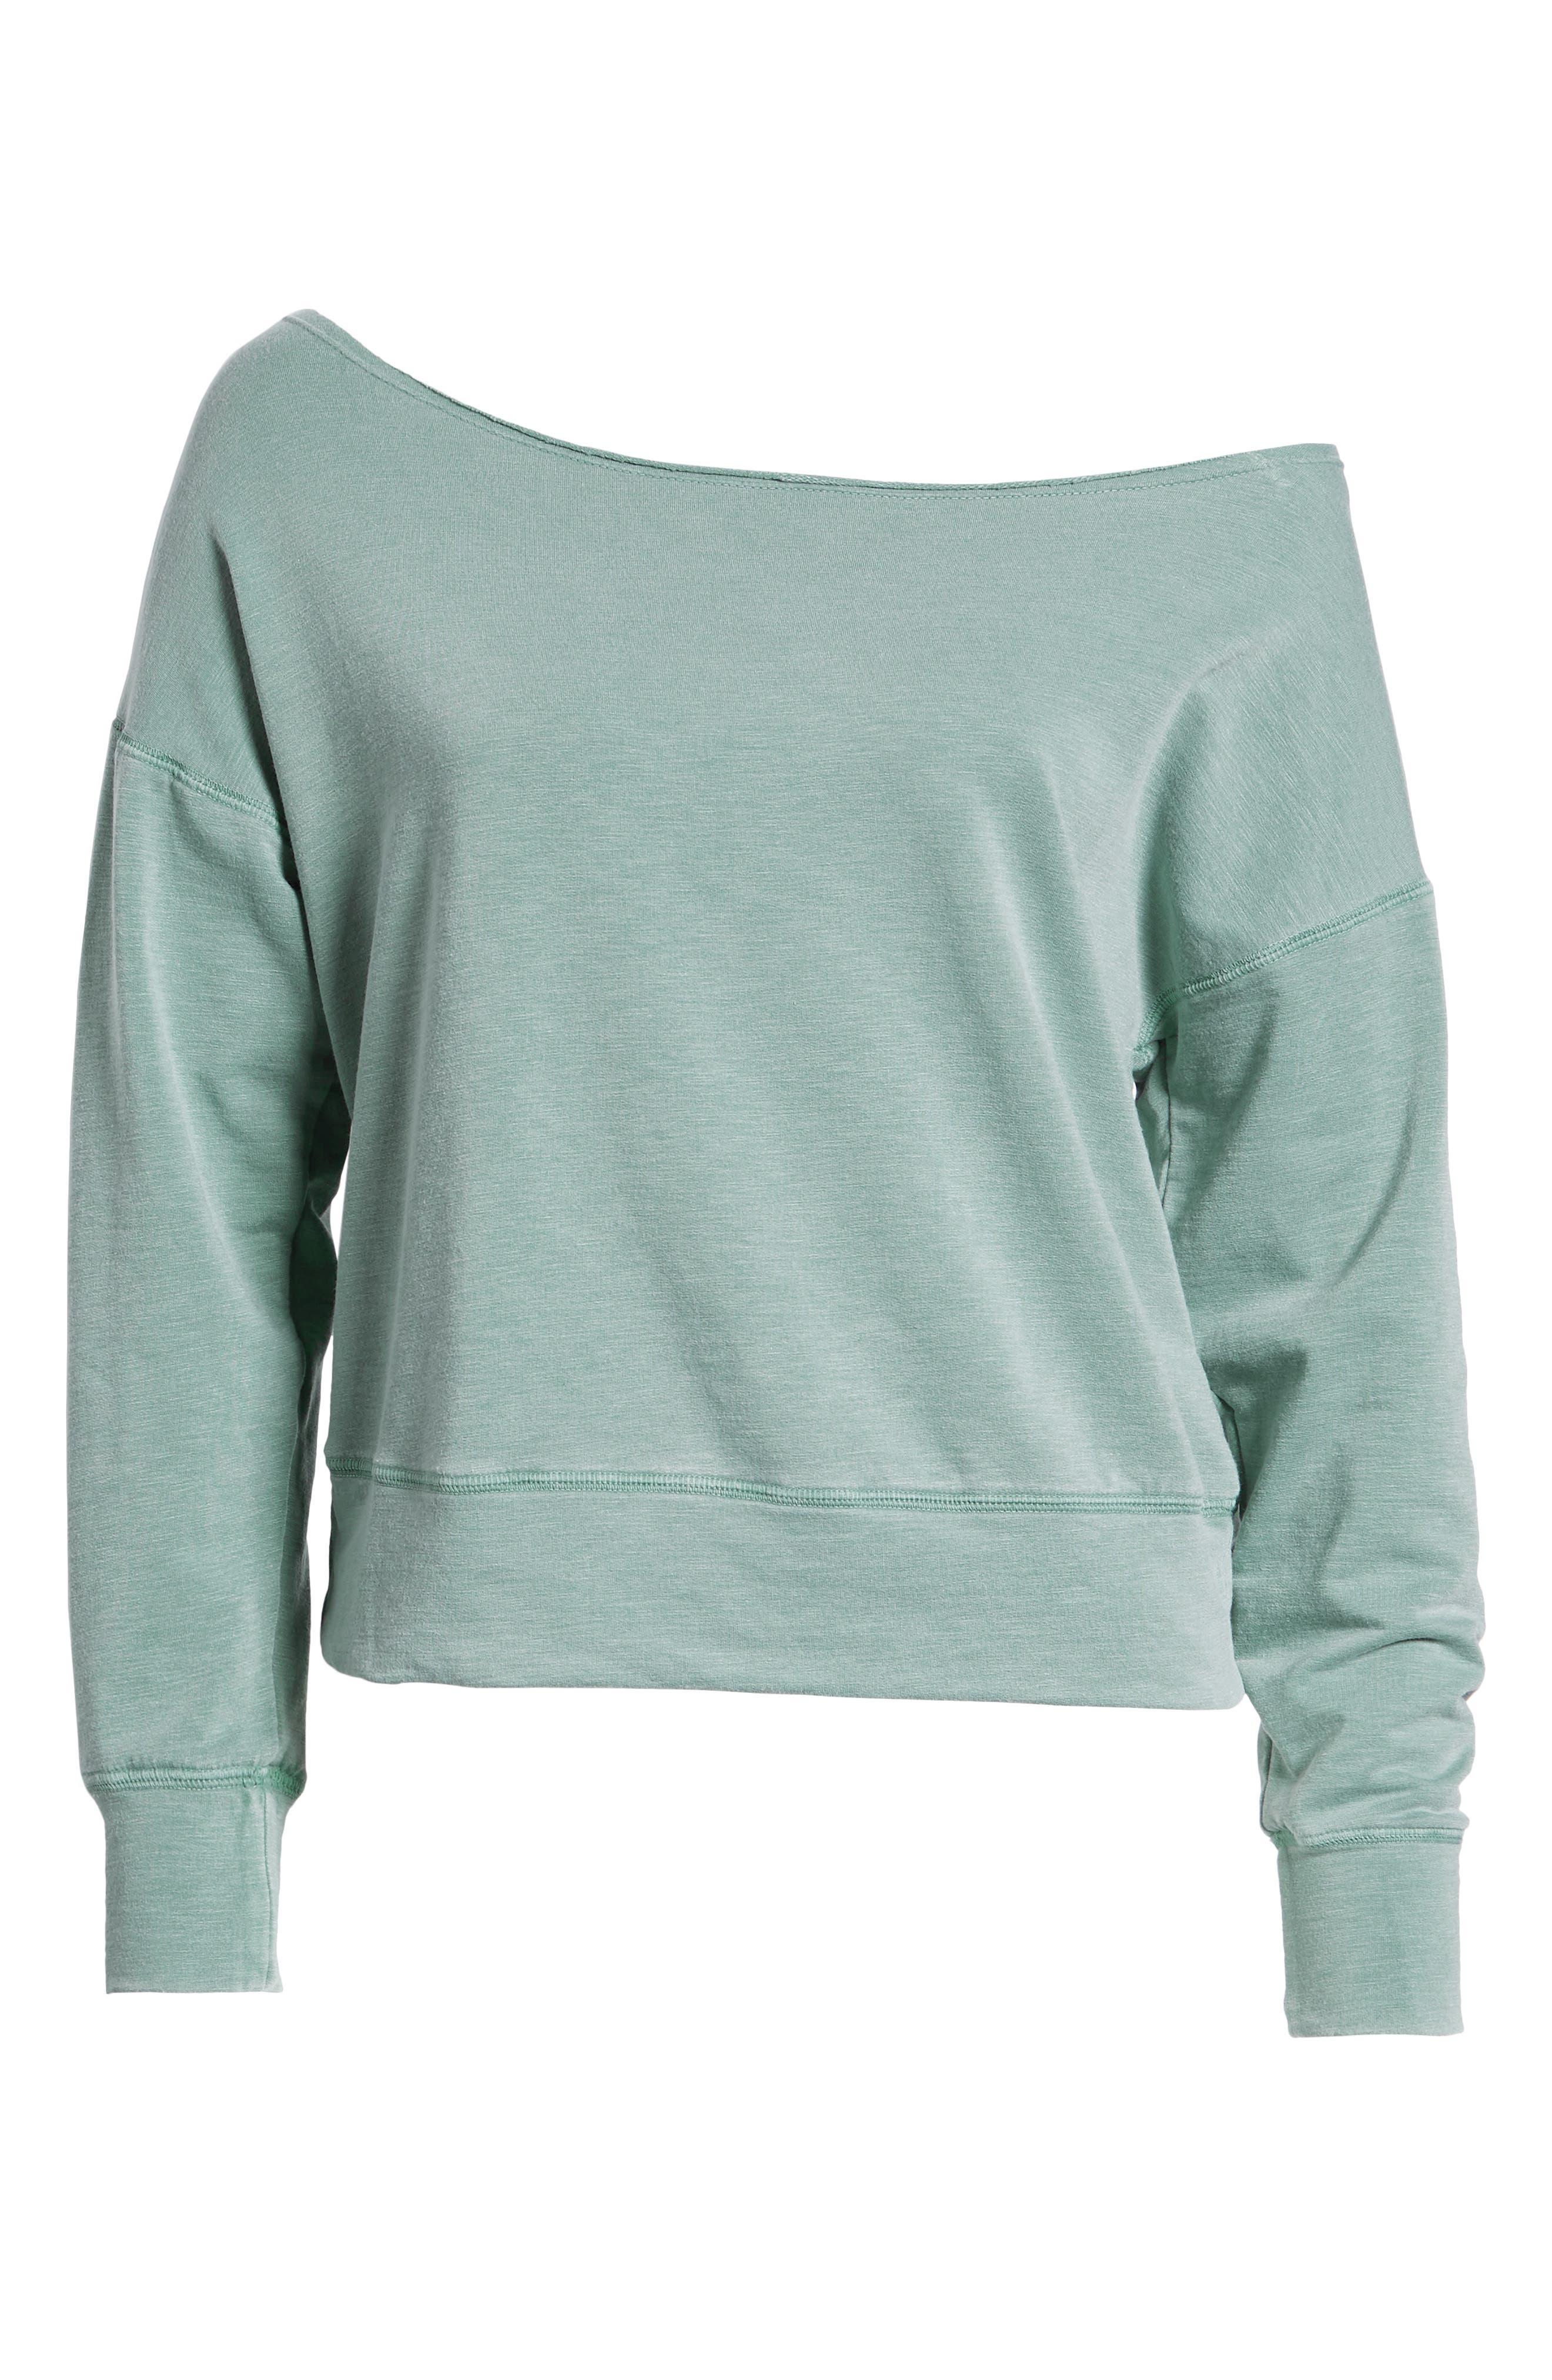 Off the Shoulder Sweatshirt,                             Alternate thumbnail 7, color,                             PIGMENT BASIL